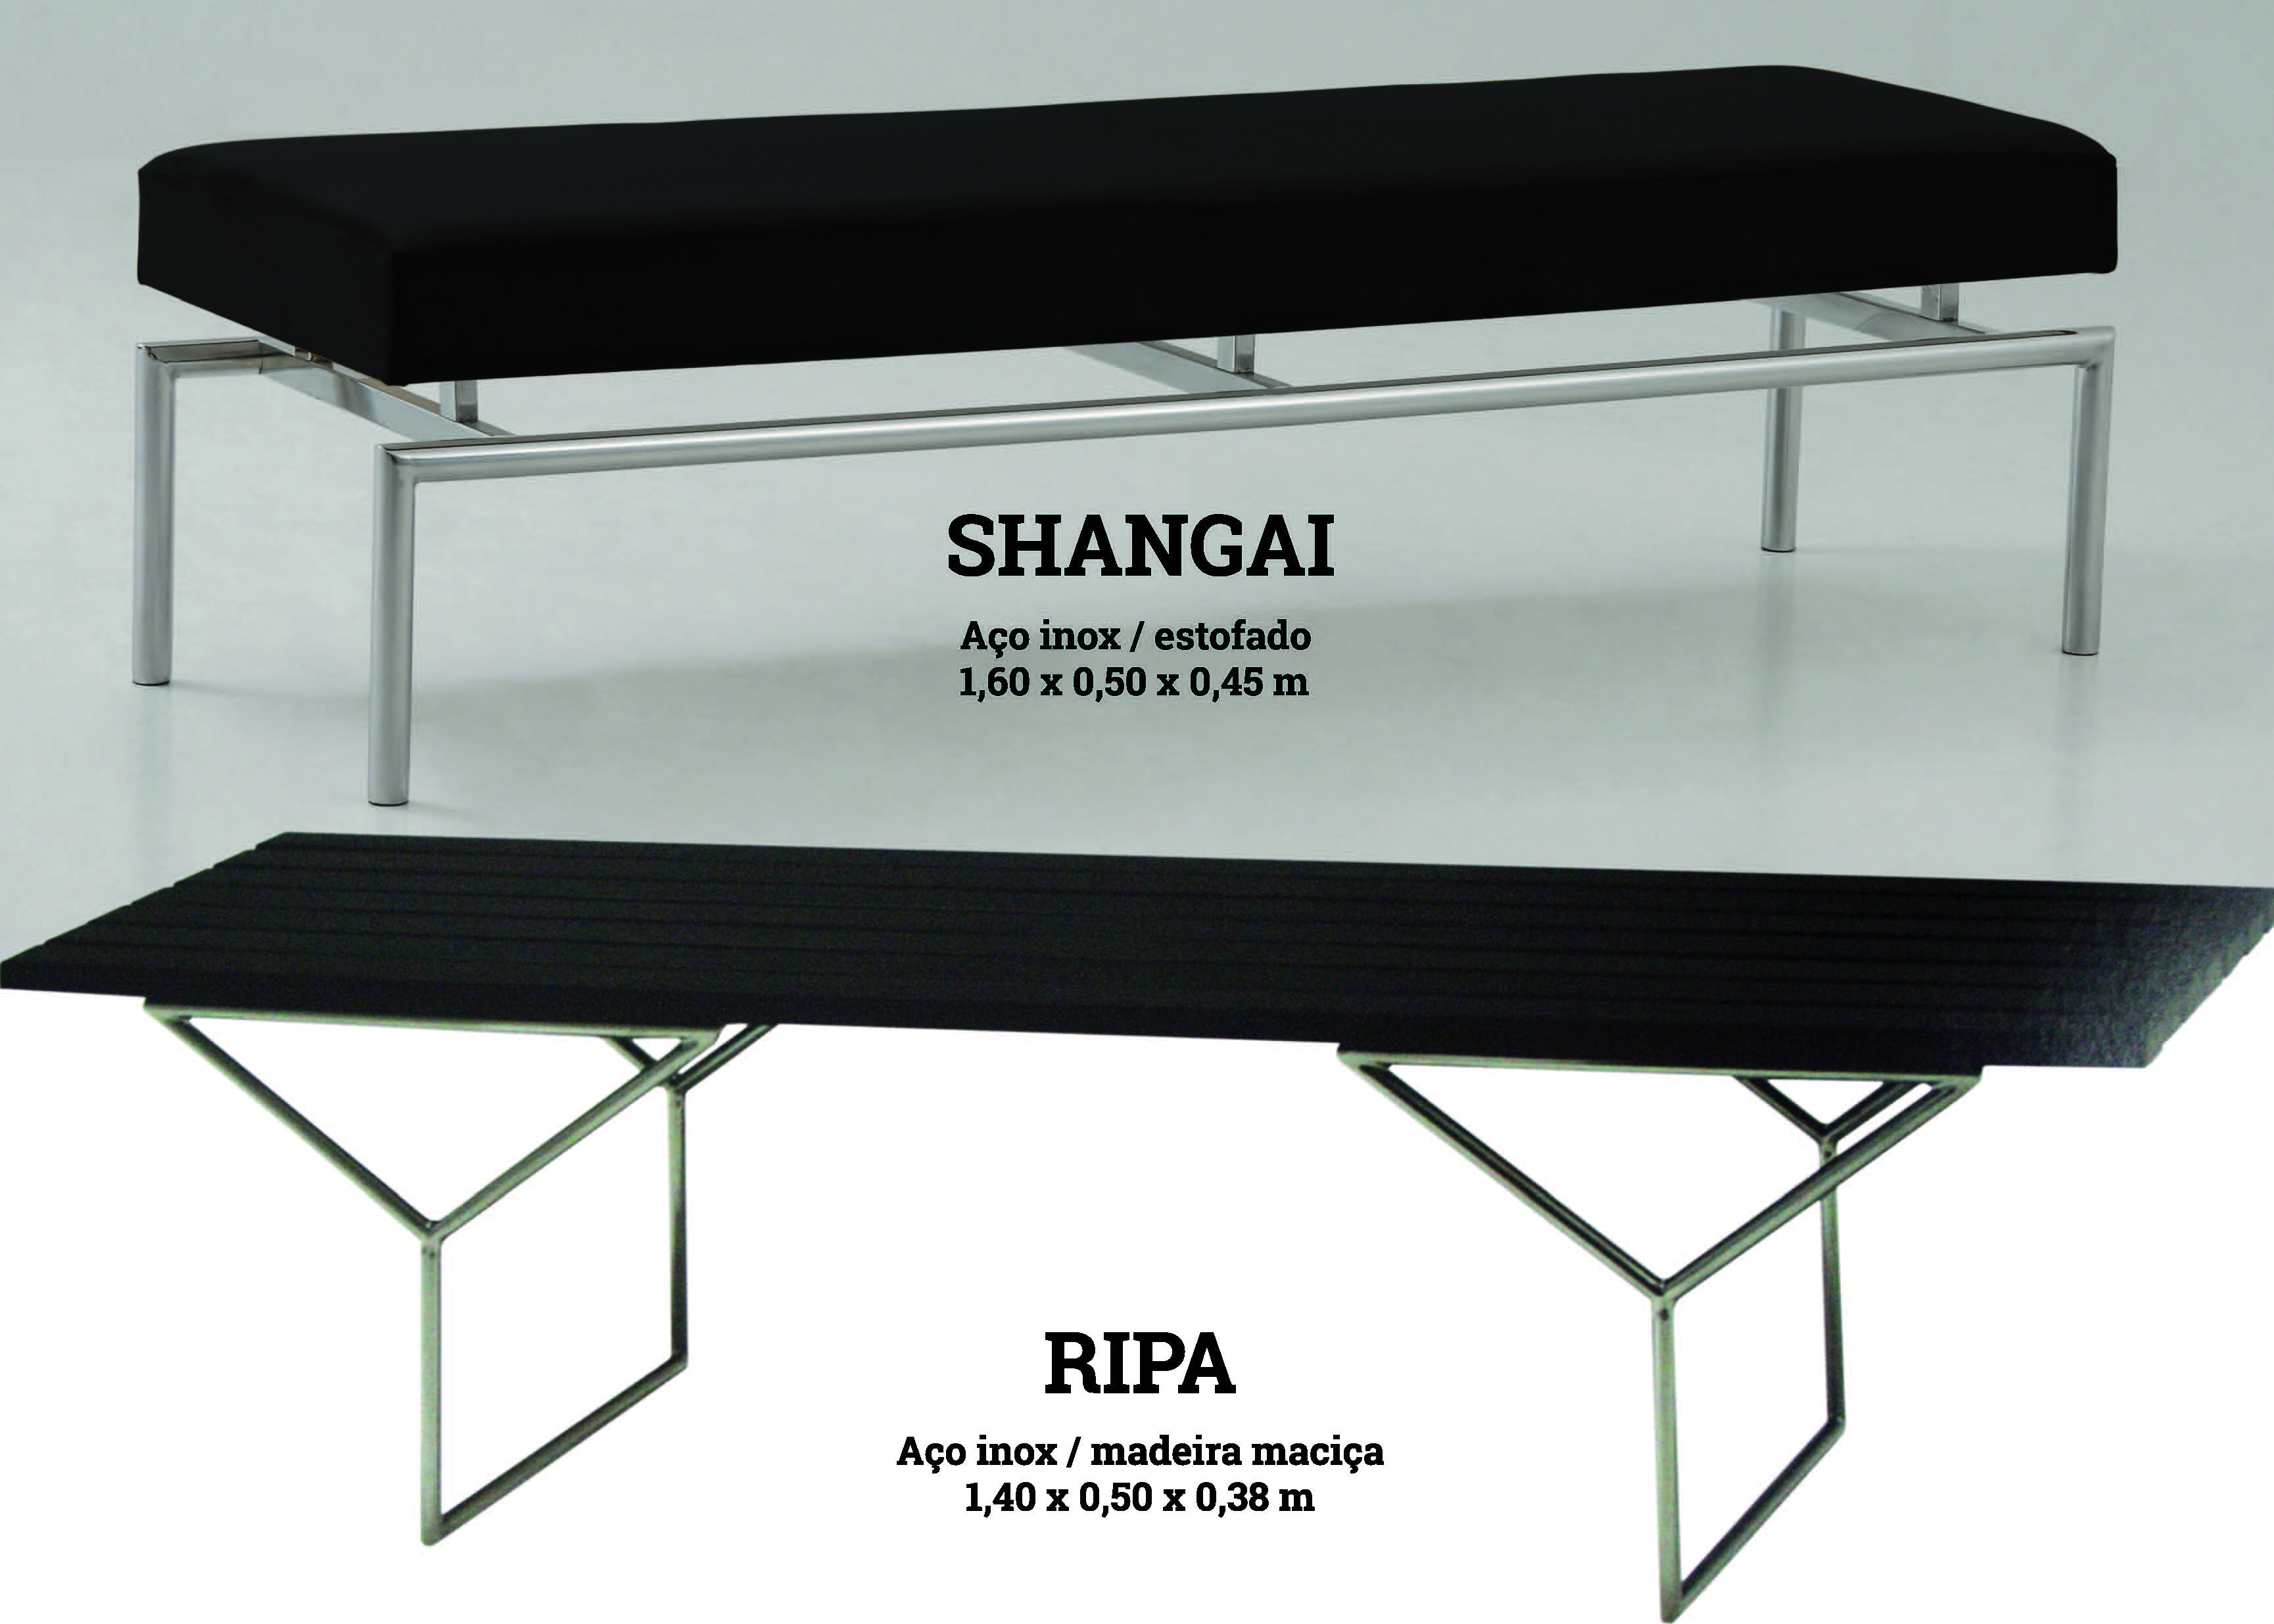 Banco Shangai e Ripa